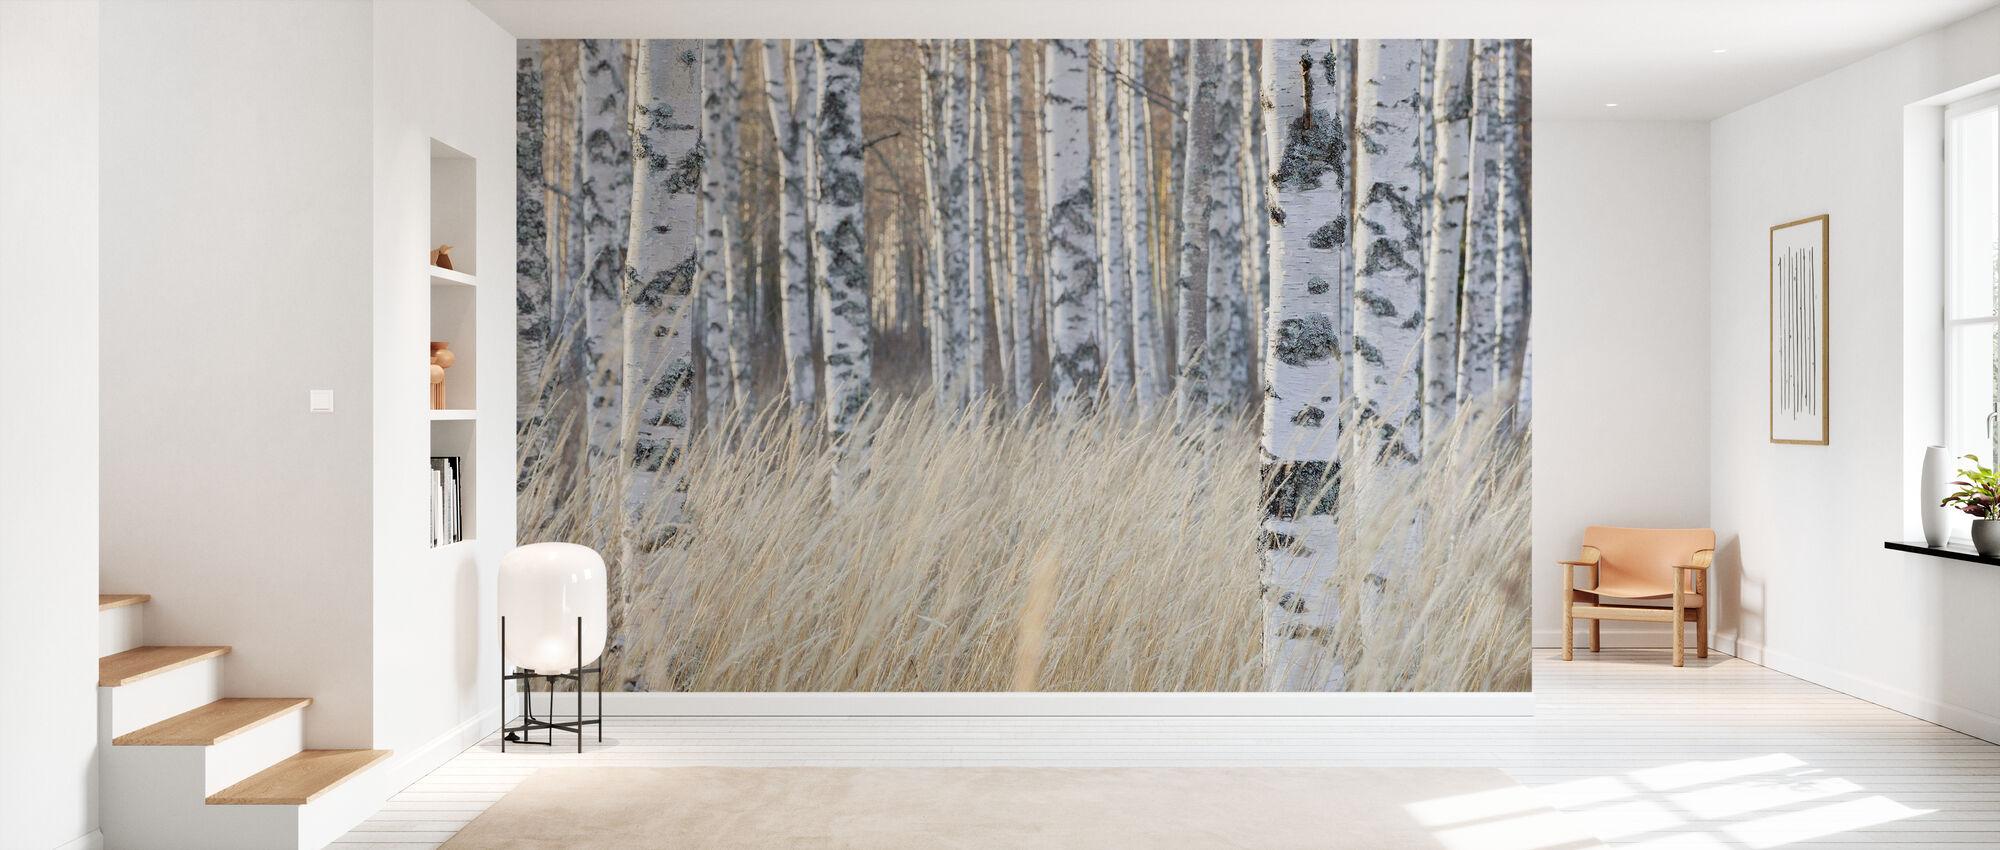 Light Birch Forest - Wallpaper - Hallway